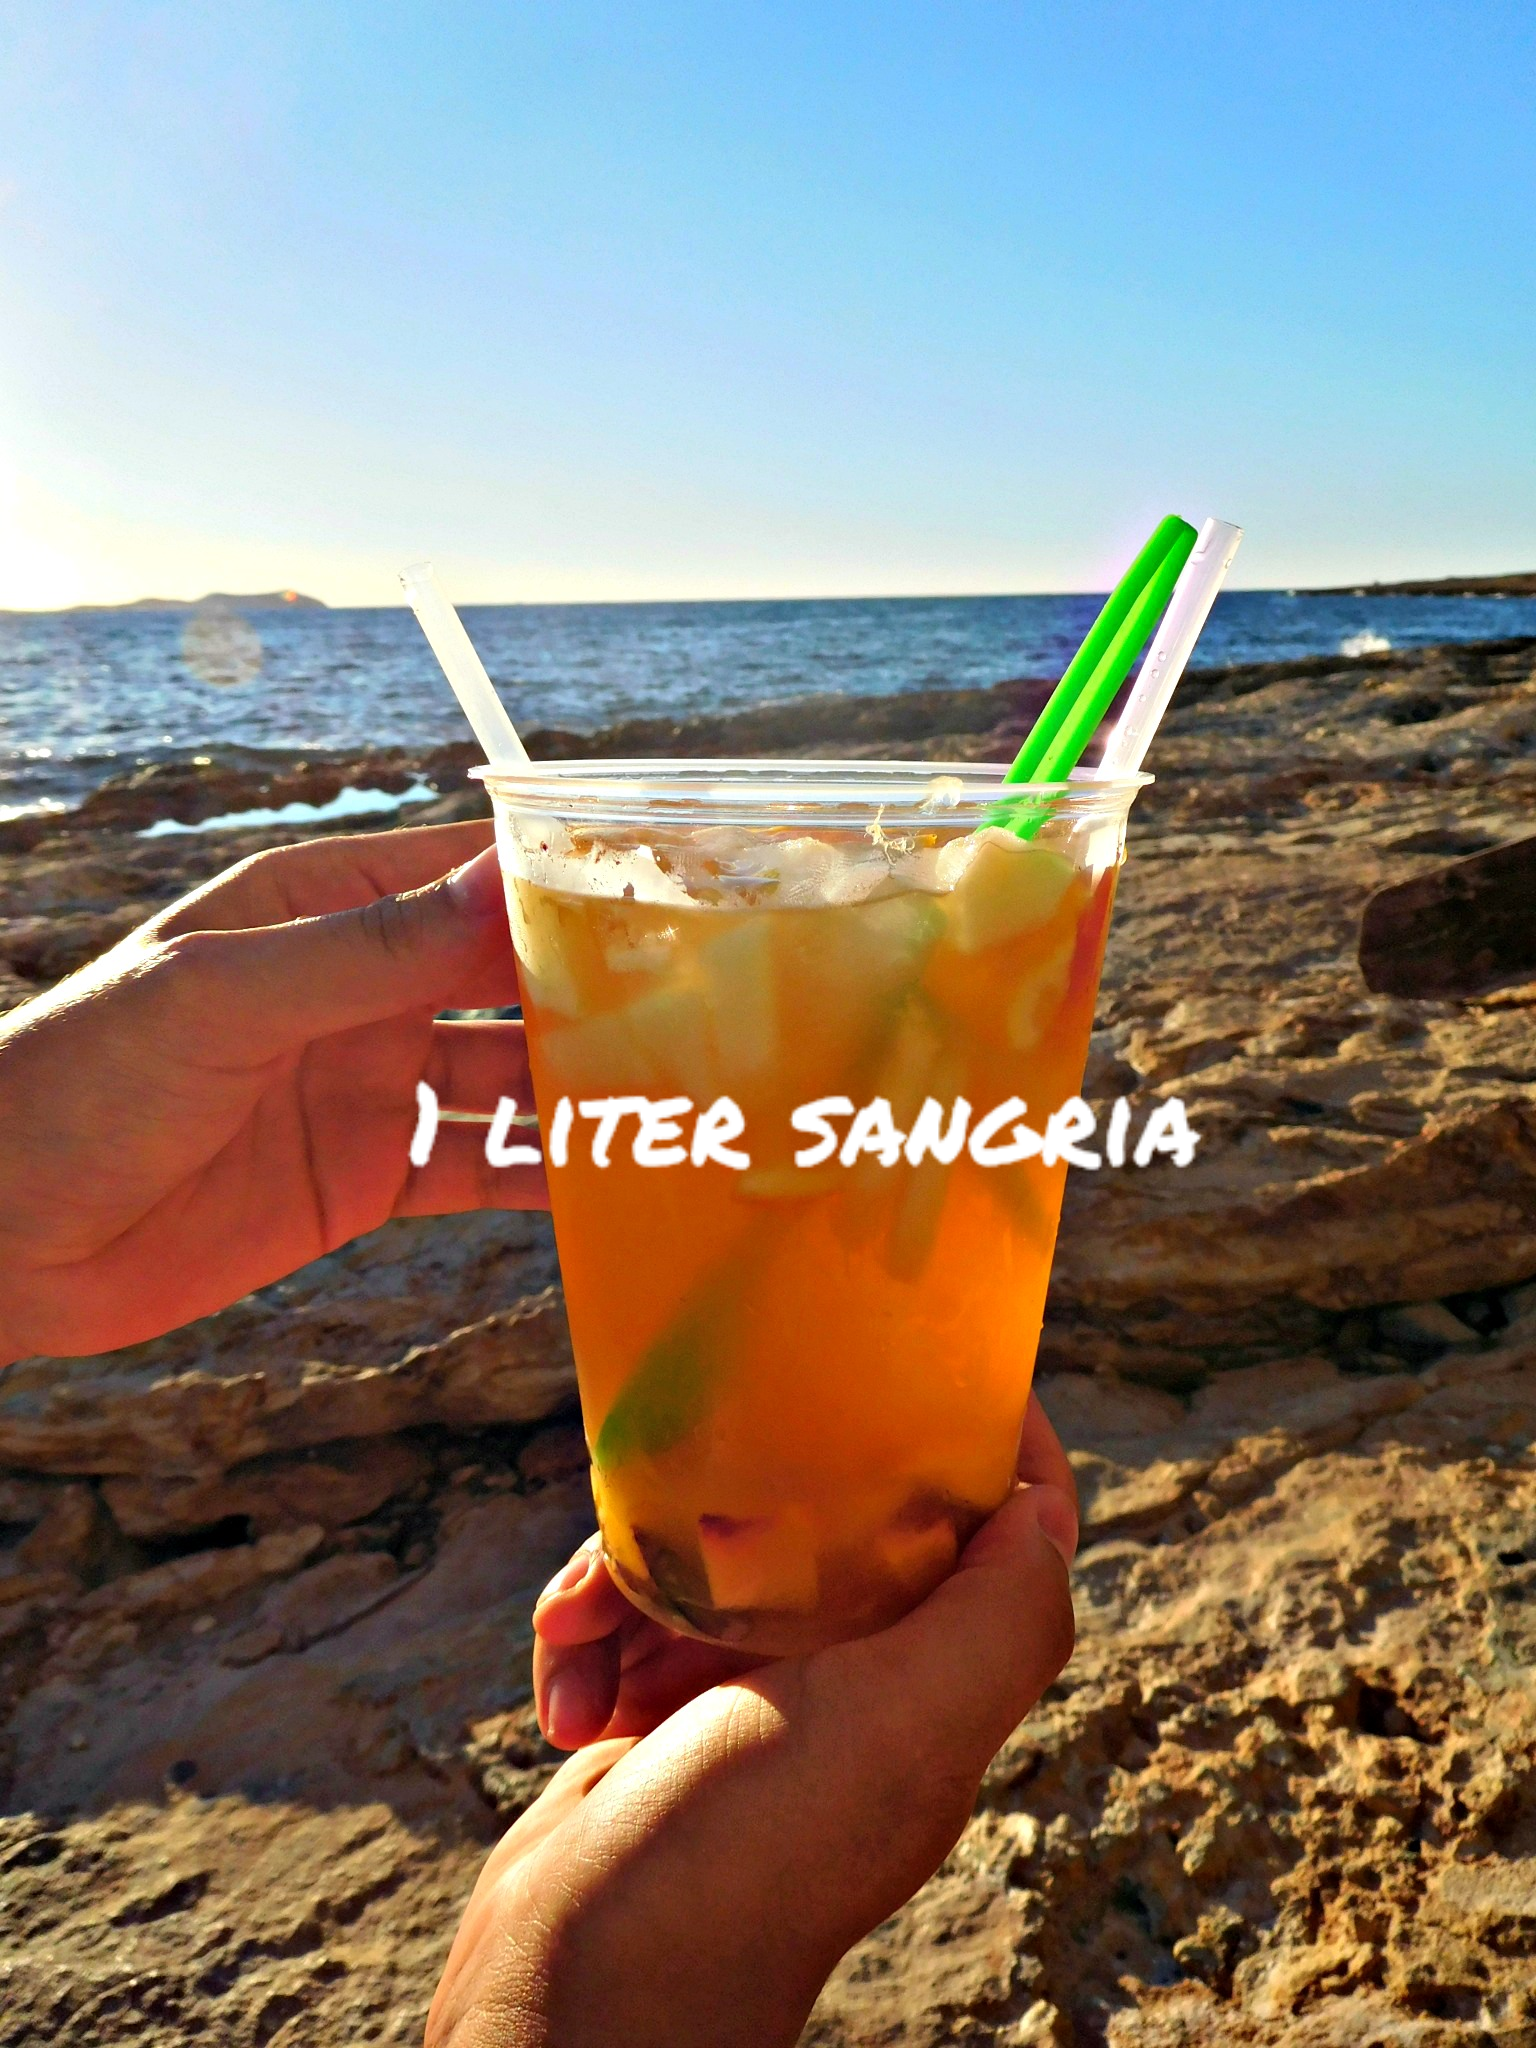 1 liter Sangrìa for an amazing sunset at Cafè del Mar, Sant Antony de Portmany (Ibiza, Baleares, Spain)